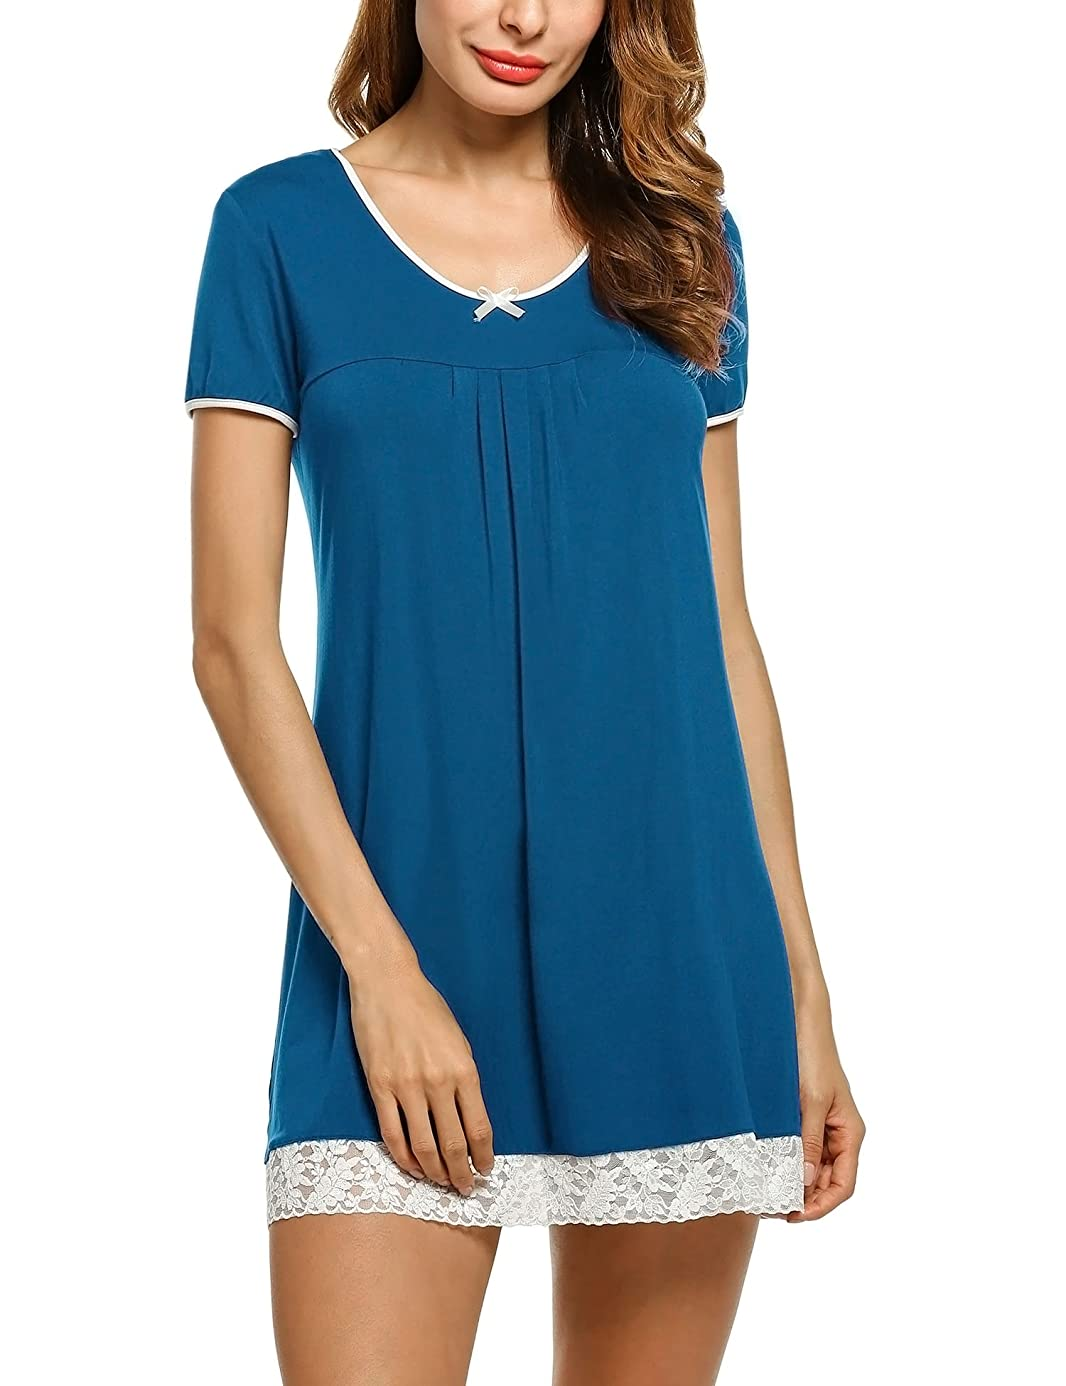 Hotouch Sleepwear Womens Cotton Nightgown Short Sleeve Sleep Nightdress Scoopneck Sleep Tee Nightshirt S-XXL pnx6627236